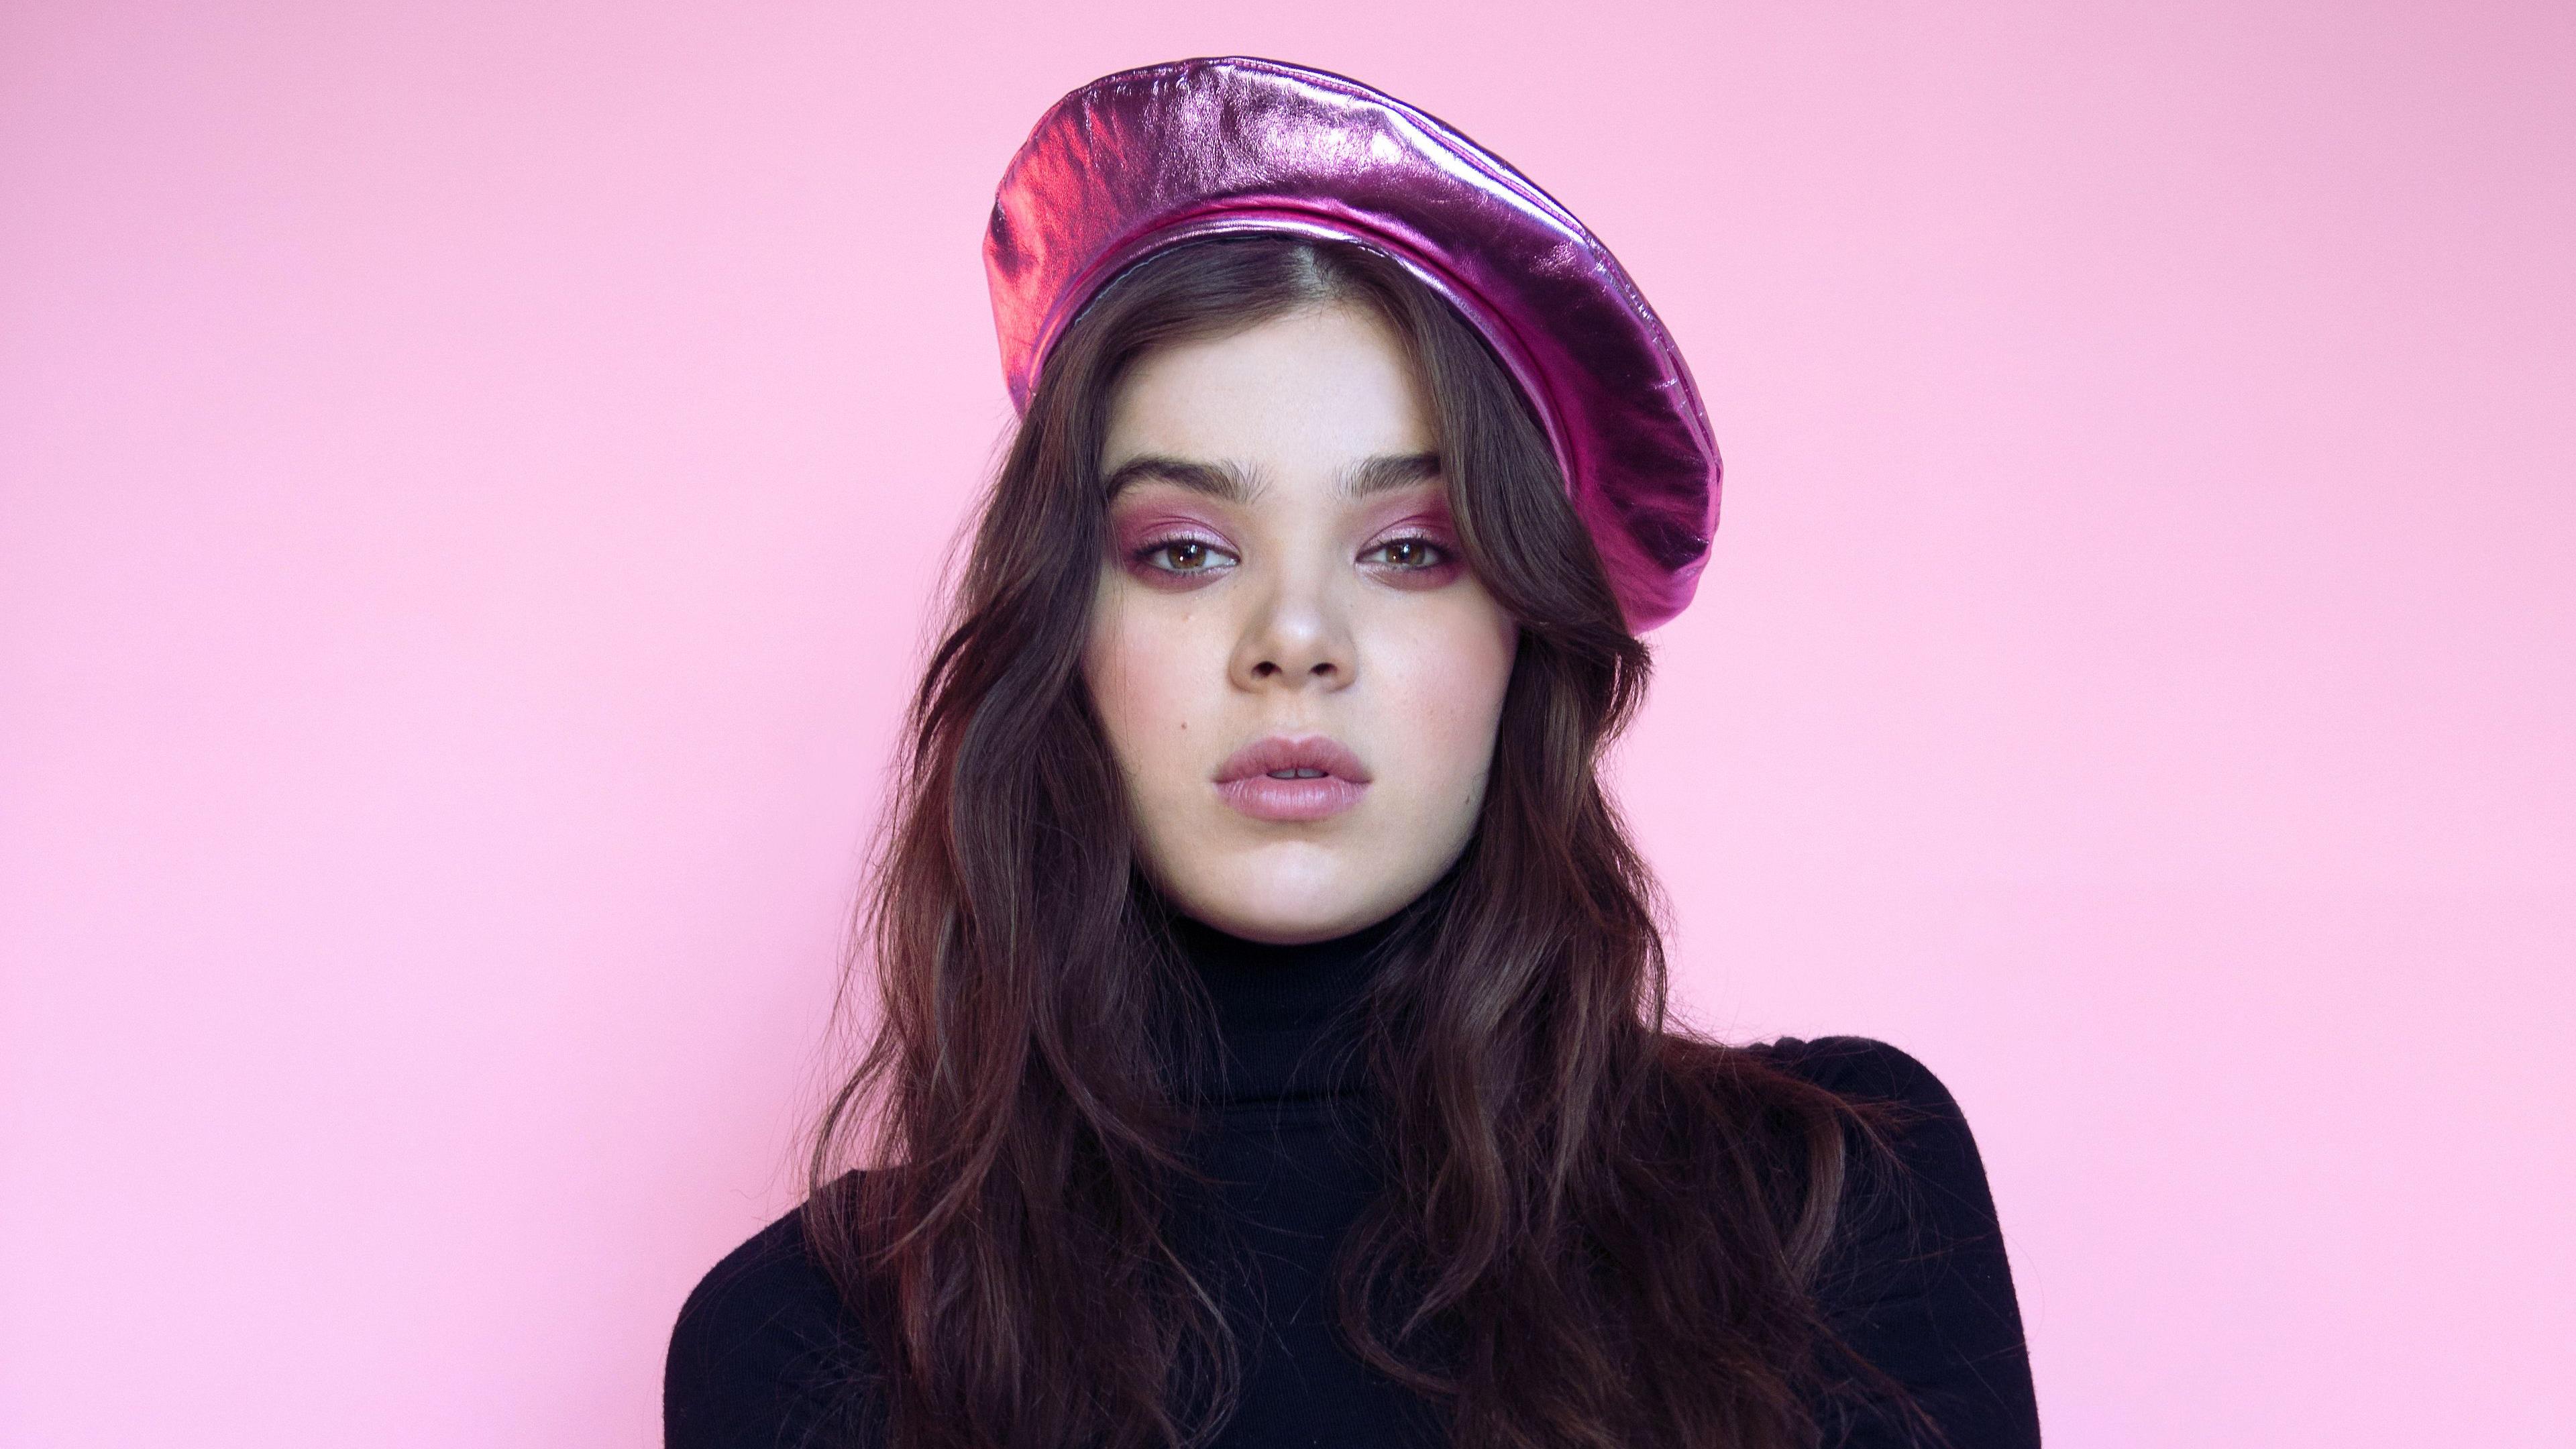 Фото молодой девушки-брюнетки в перламутровом берете